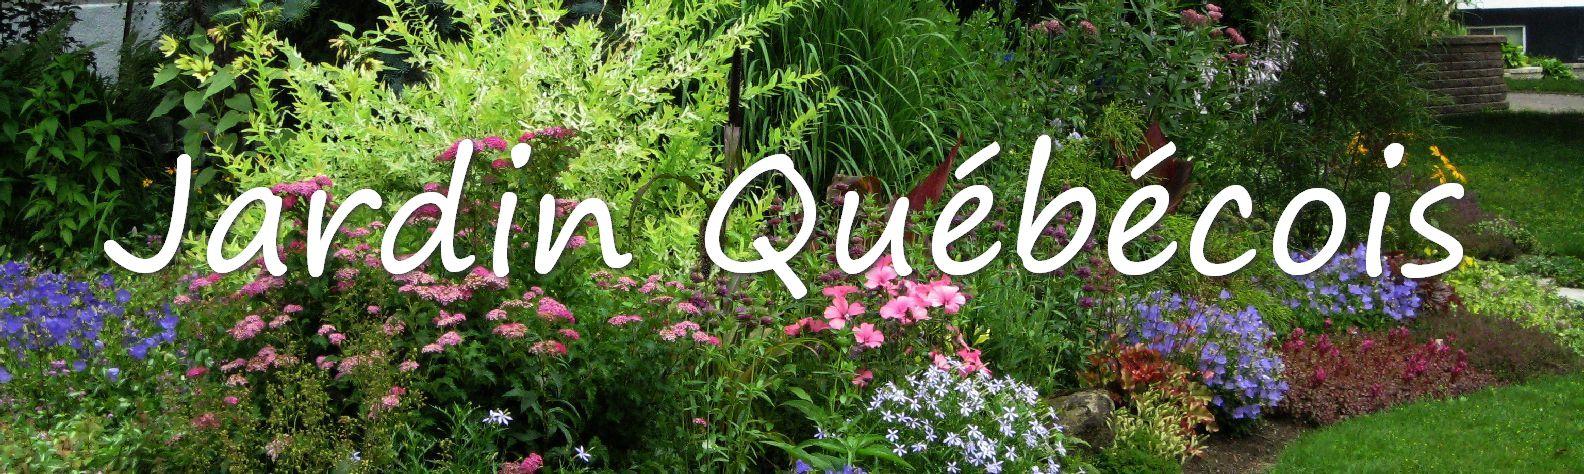 plantes vertes jardinières graminés